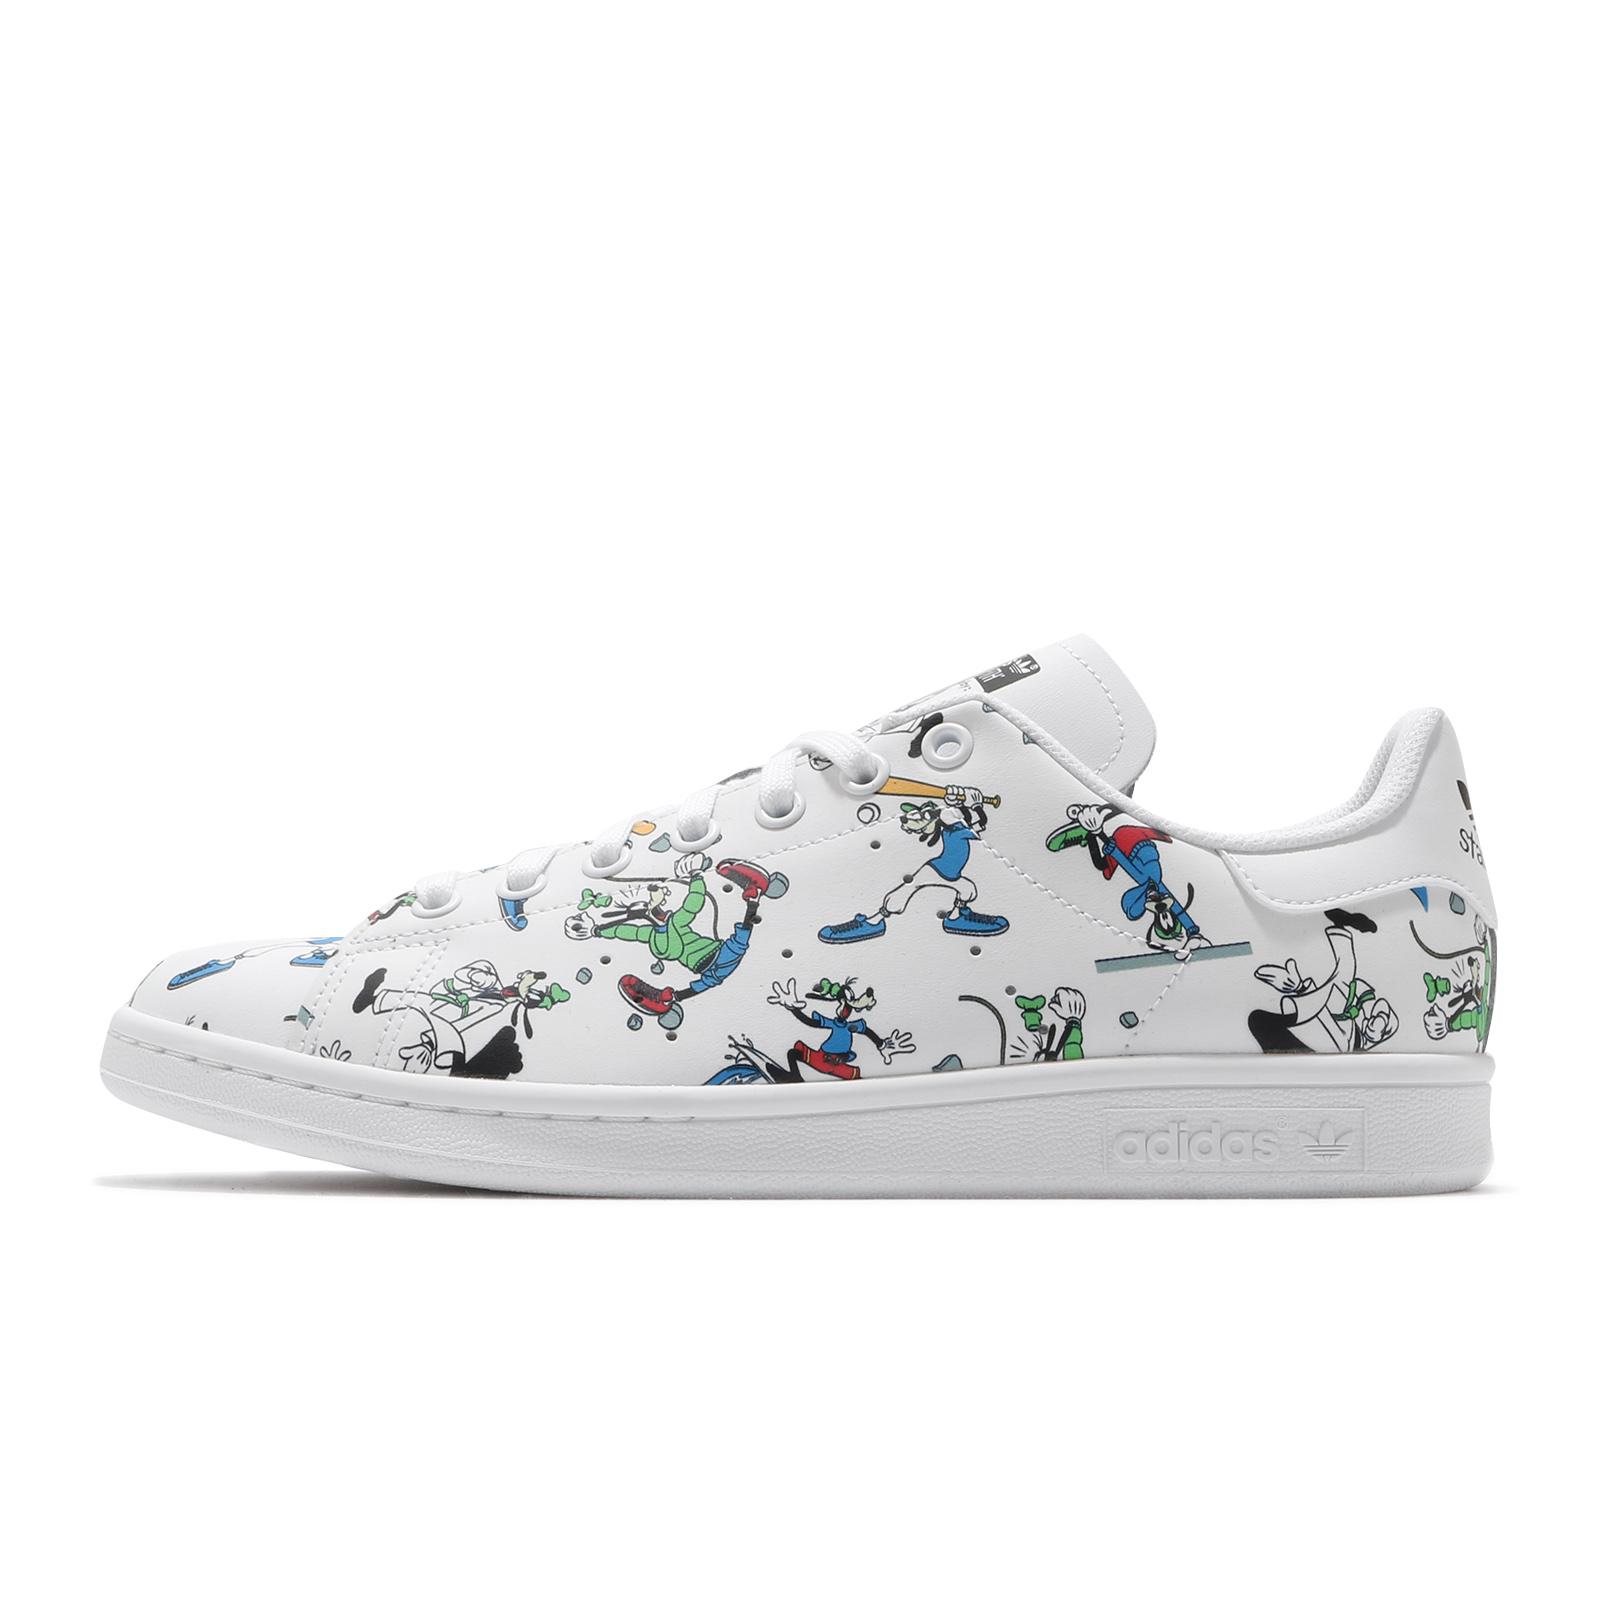 Adidas x DISNEY Stan Smith Goofy 高飛 聯名款 男鞋 迪士尼 【ACS】 FZ0061